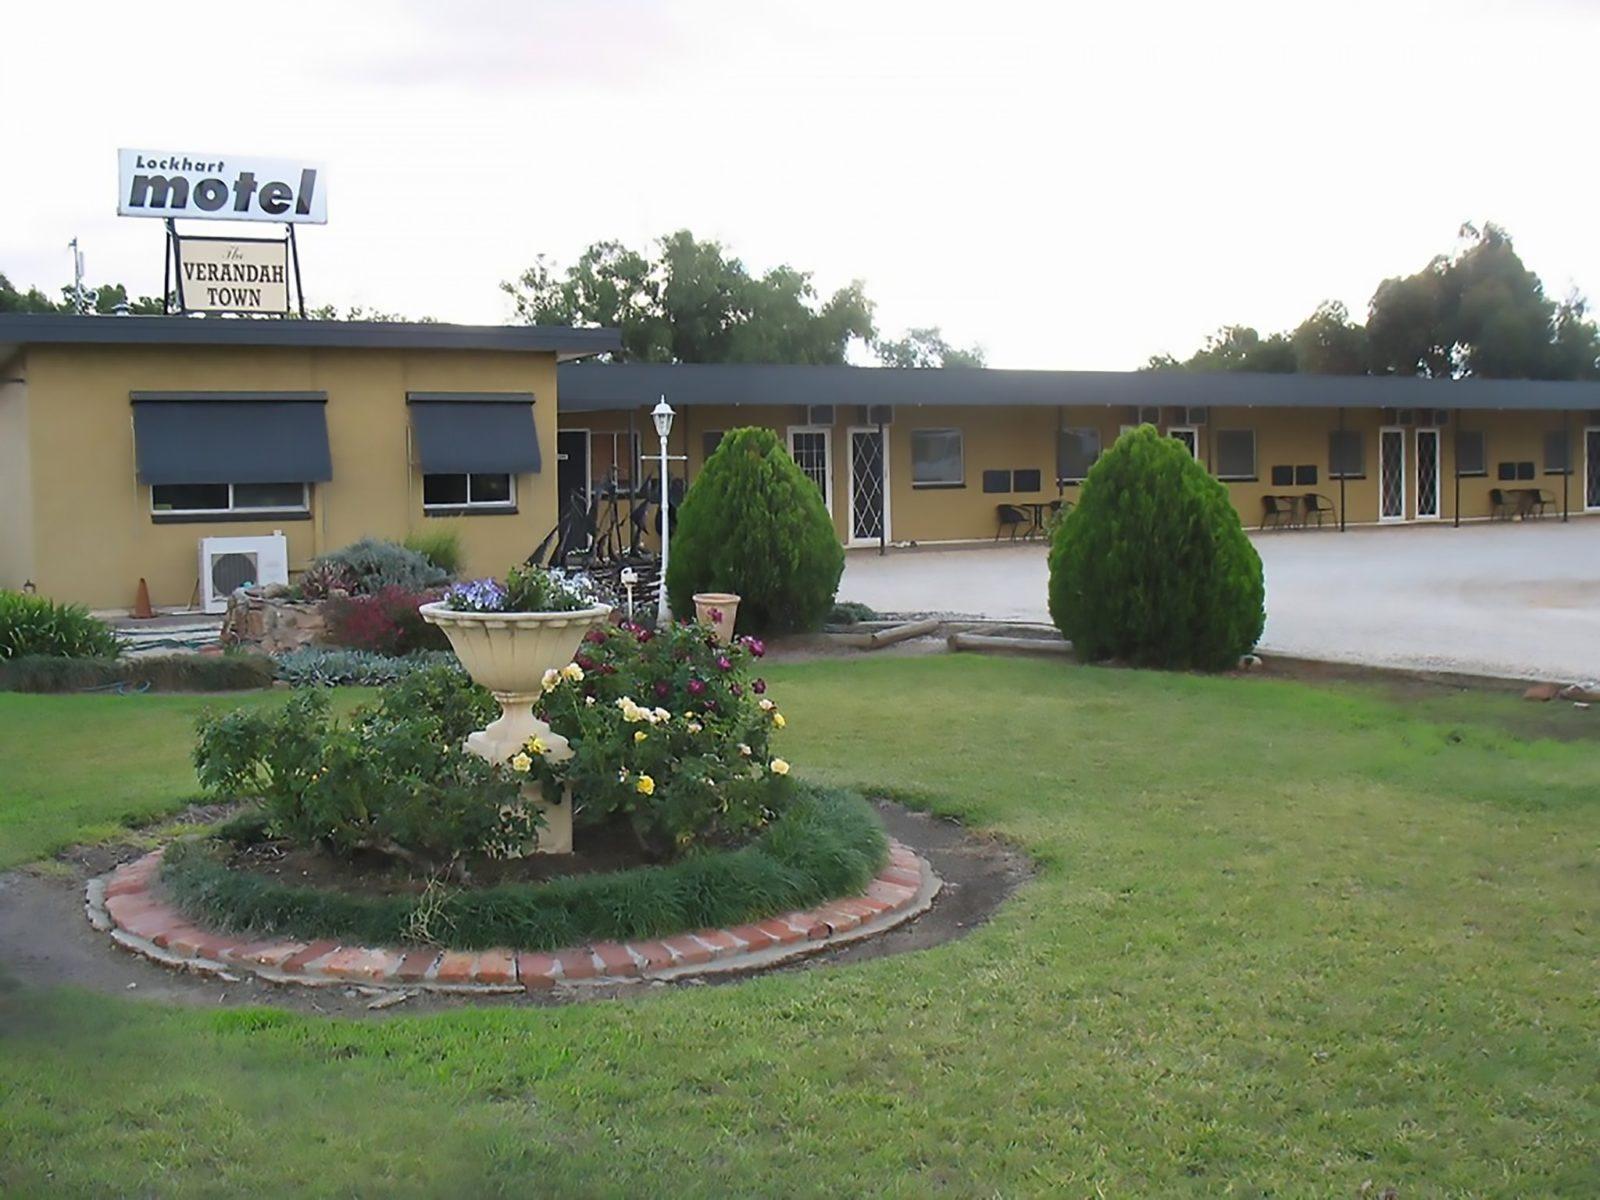 Lockhart Motel